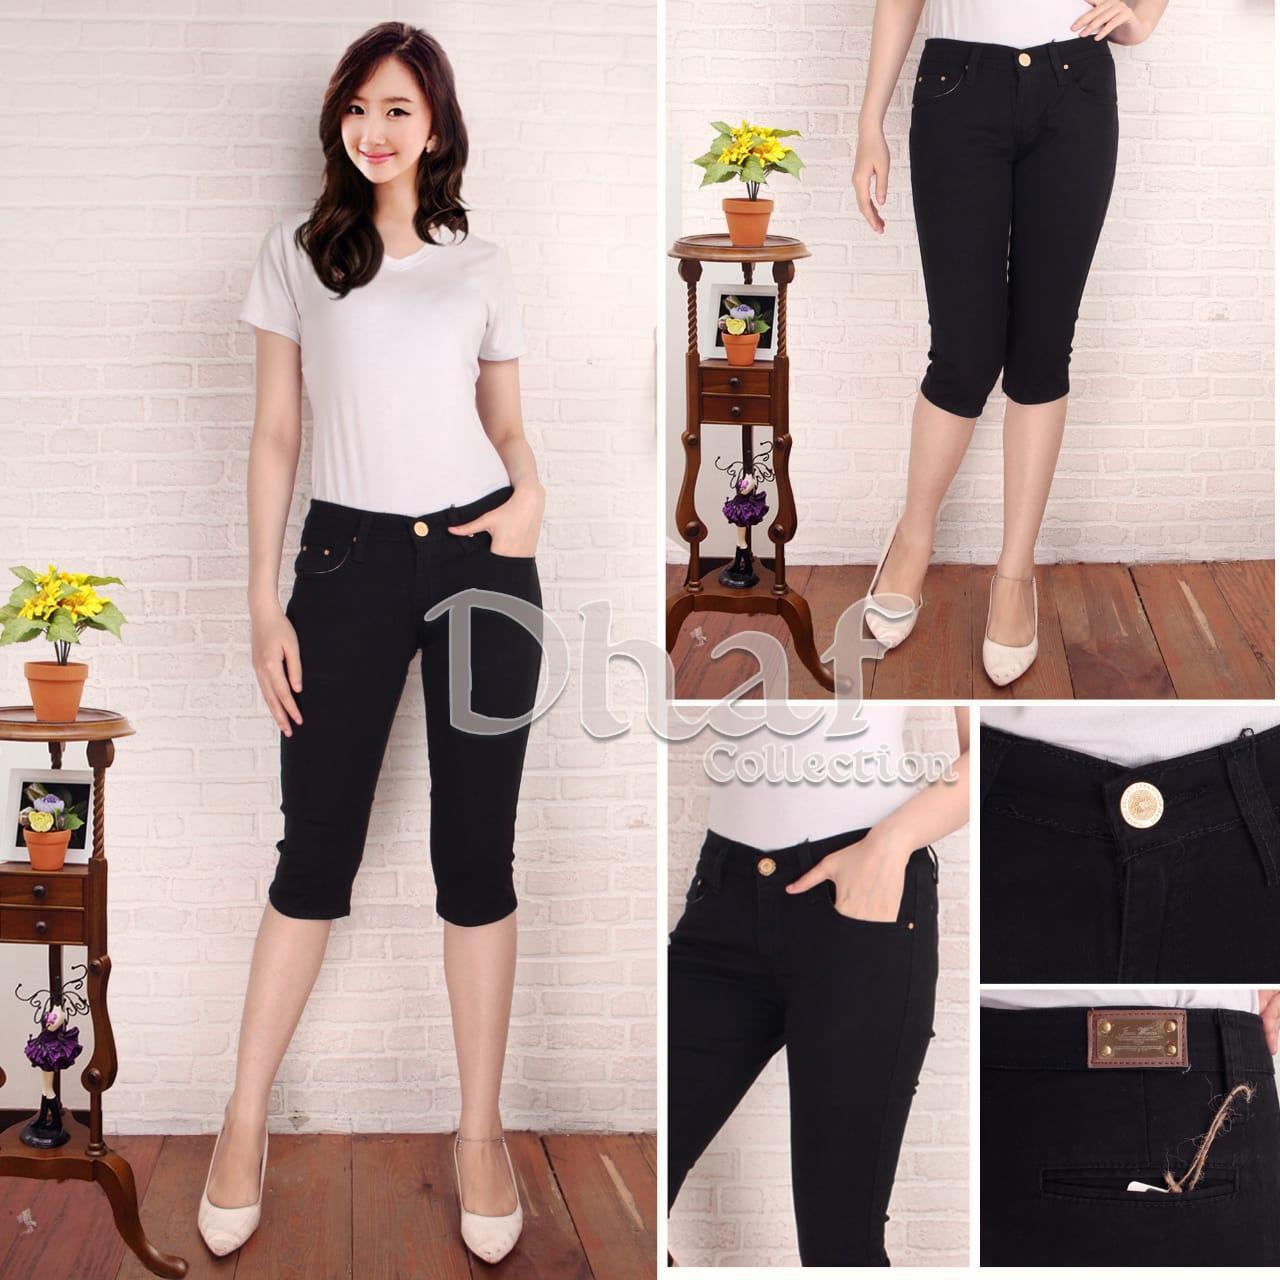 Celana jeans wanita 7/8 bahan melar ngaret street skiny softjeans slimfit pensil ripped denim